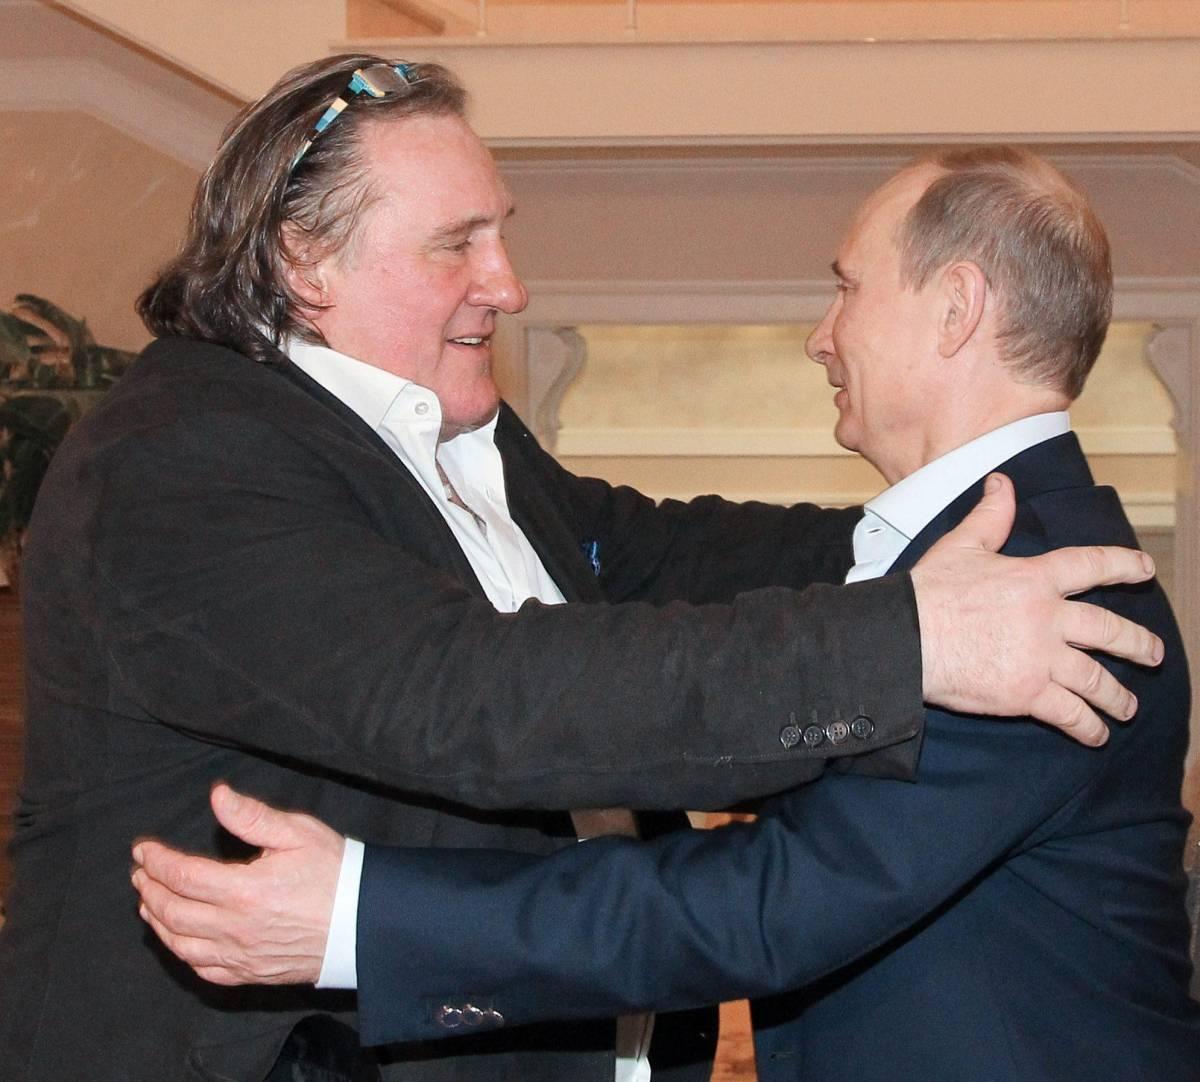 Gerard Depardieu riceve il passaporto russo da Putin